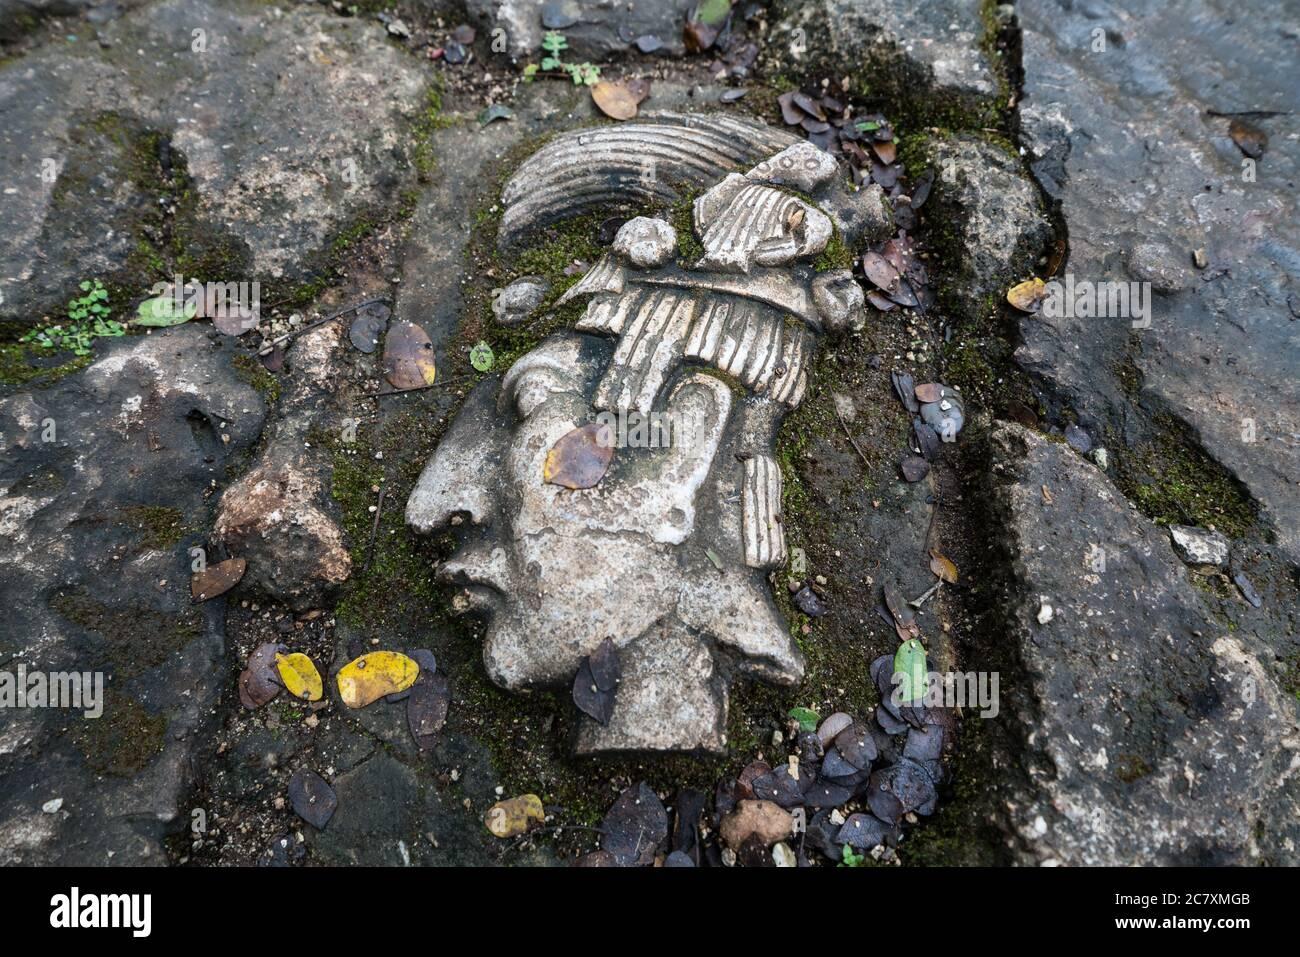 Réplica de una talla maya en la pasarela en Cenote Samula cerca de Dzitnup, Yucatán, México. Foto de stock